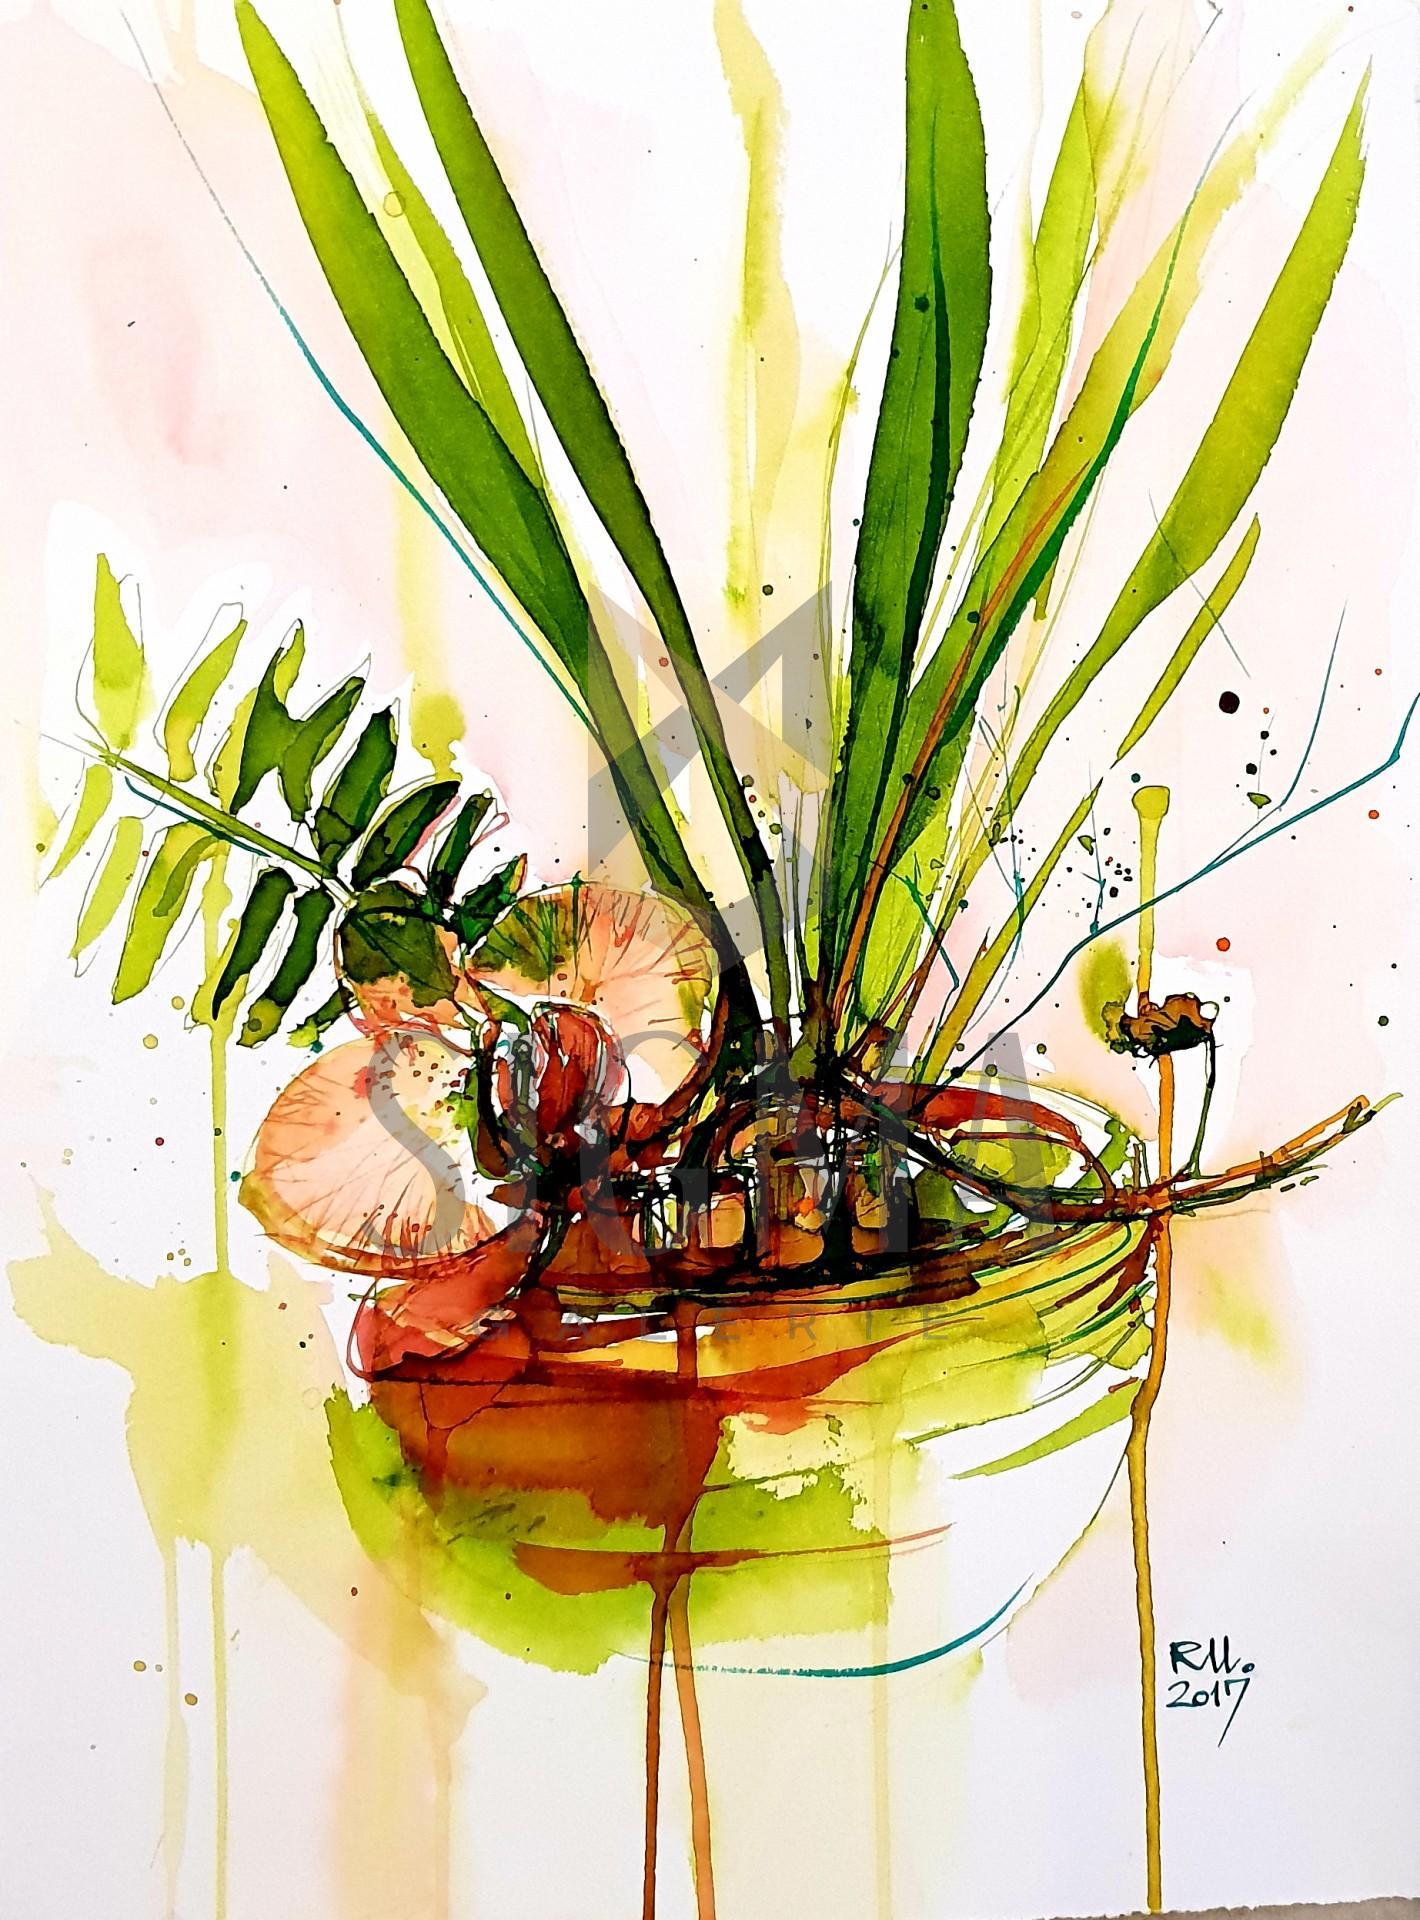 Tablou, Flori - Orhidee, autor: Raluca Morariu, tus si acuarela pe hartie Canson, dimensiuni: 38 x 28 cm